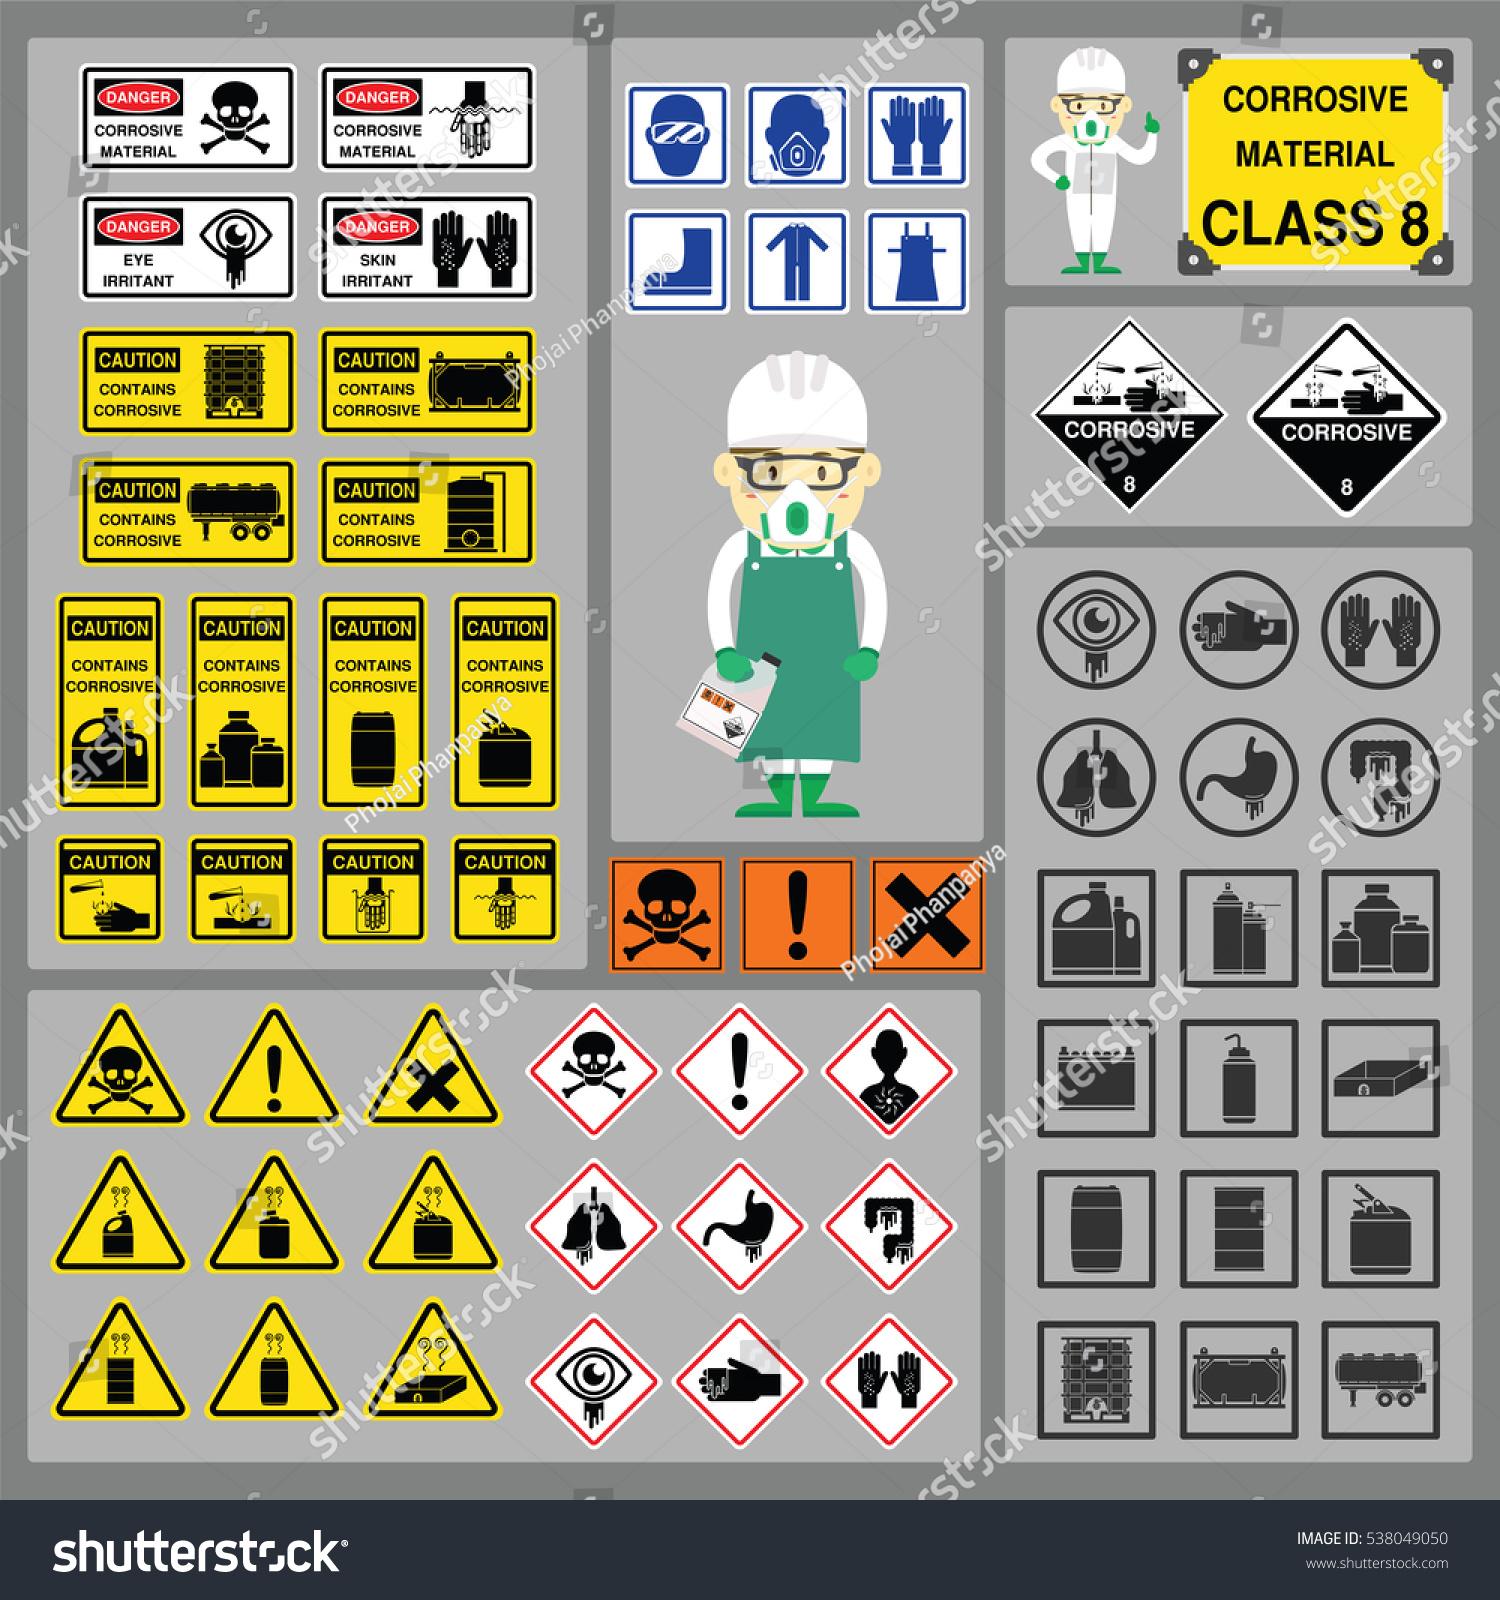 Dangerous goods hazardous materials set signs stock vector dangerous goods and hazardous materials set of signs and symbols of corrosive material class with buycottarizona Images